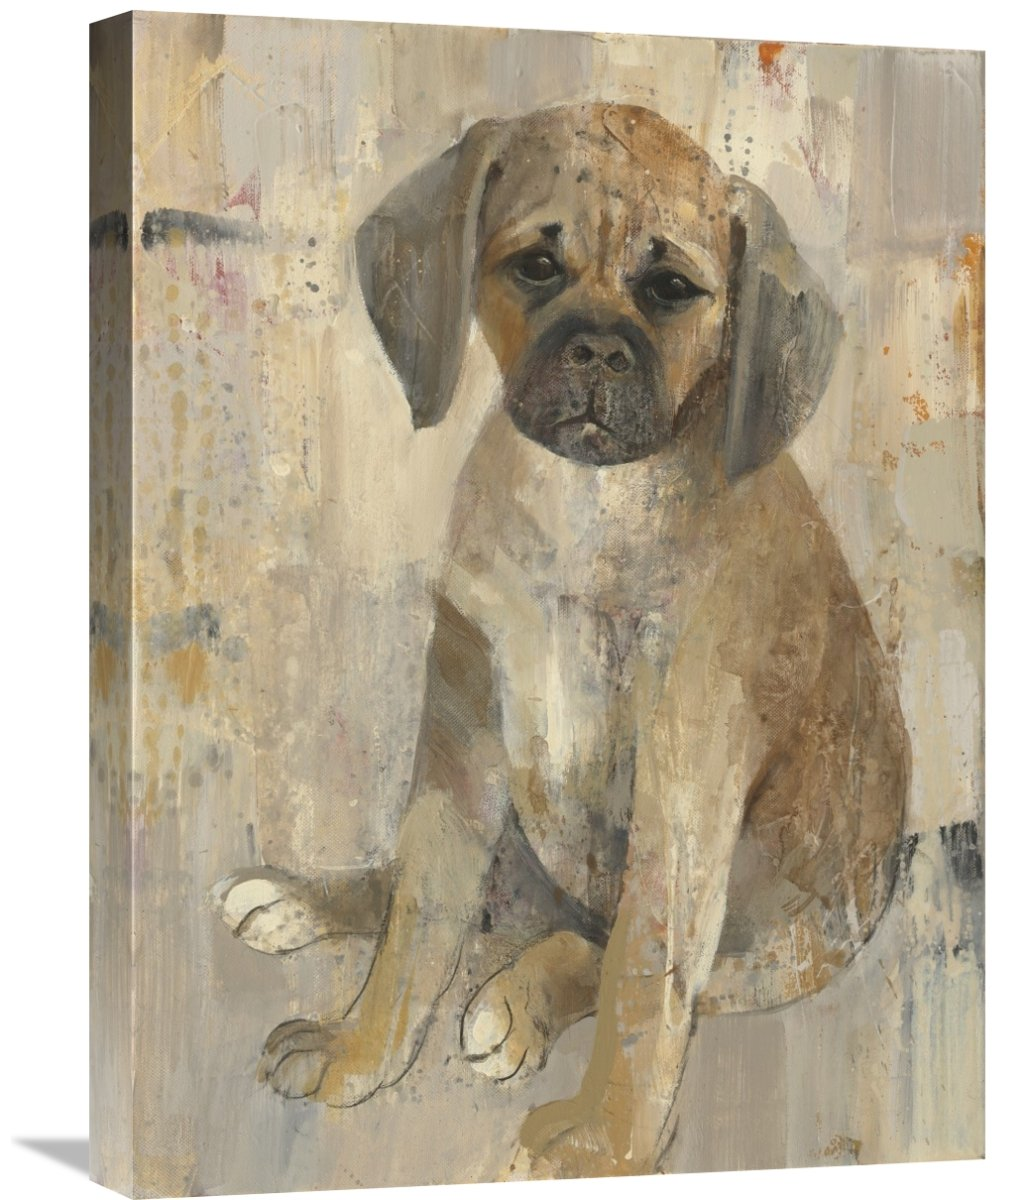 Global GalleryAlbena Hristova Paco Giclee Stretched Canvas Artwork 18 x 24